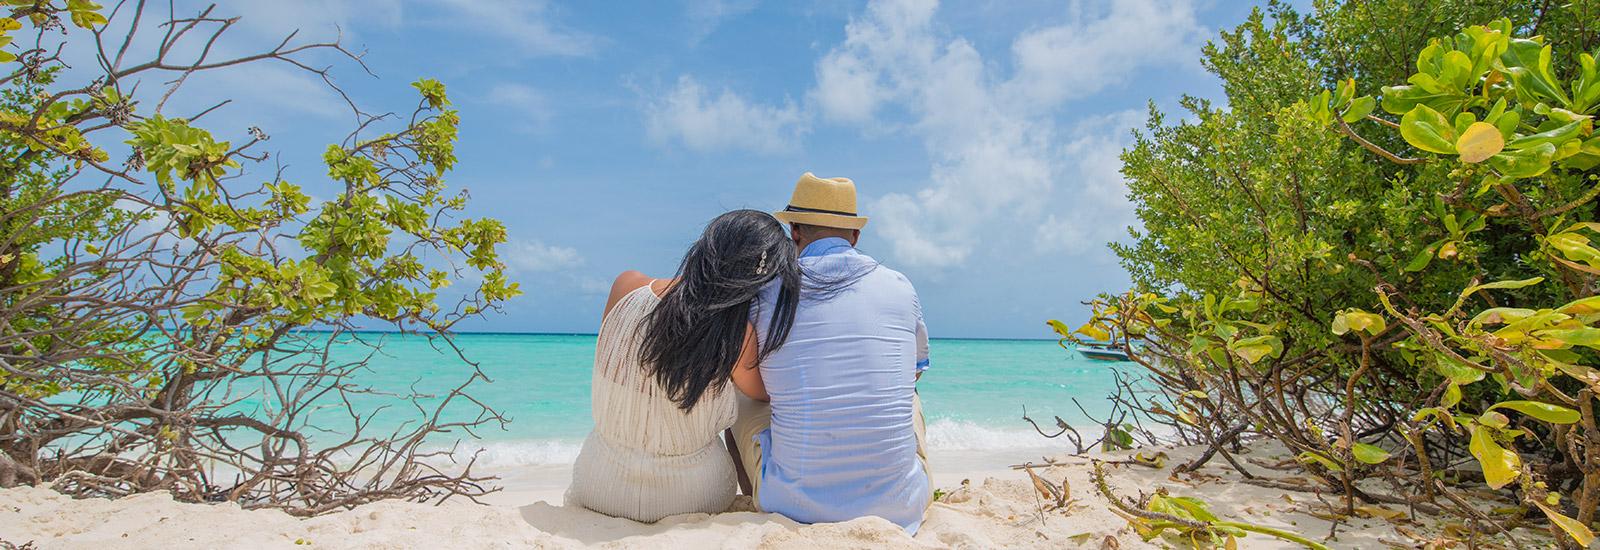 Best resort for couple